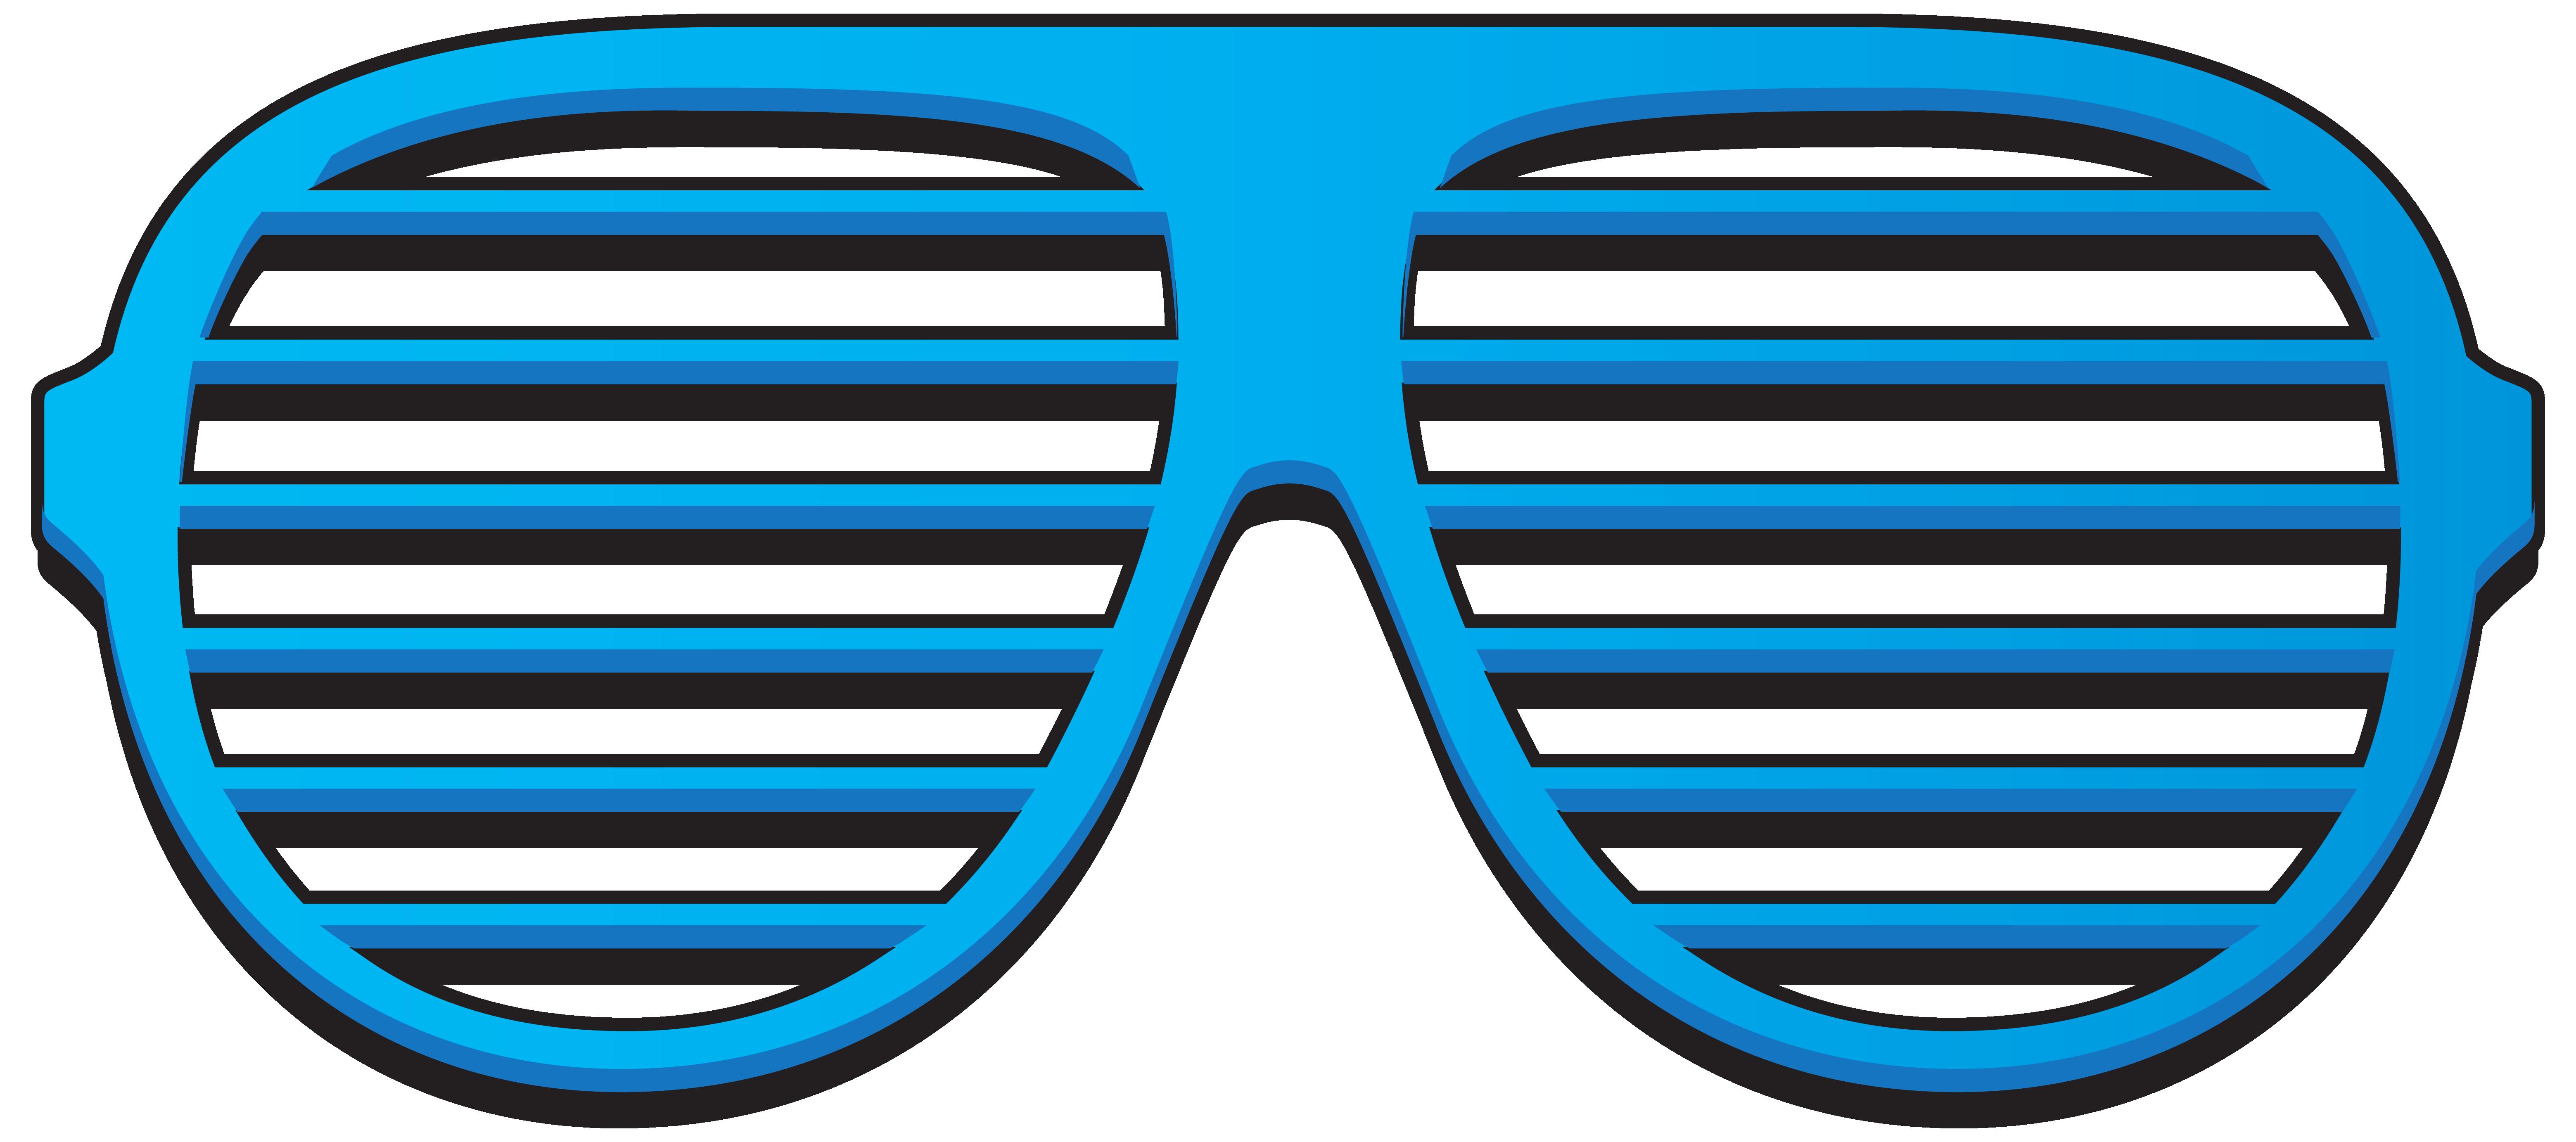 Shutter shades Sunglasses Blue Clip art.